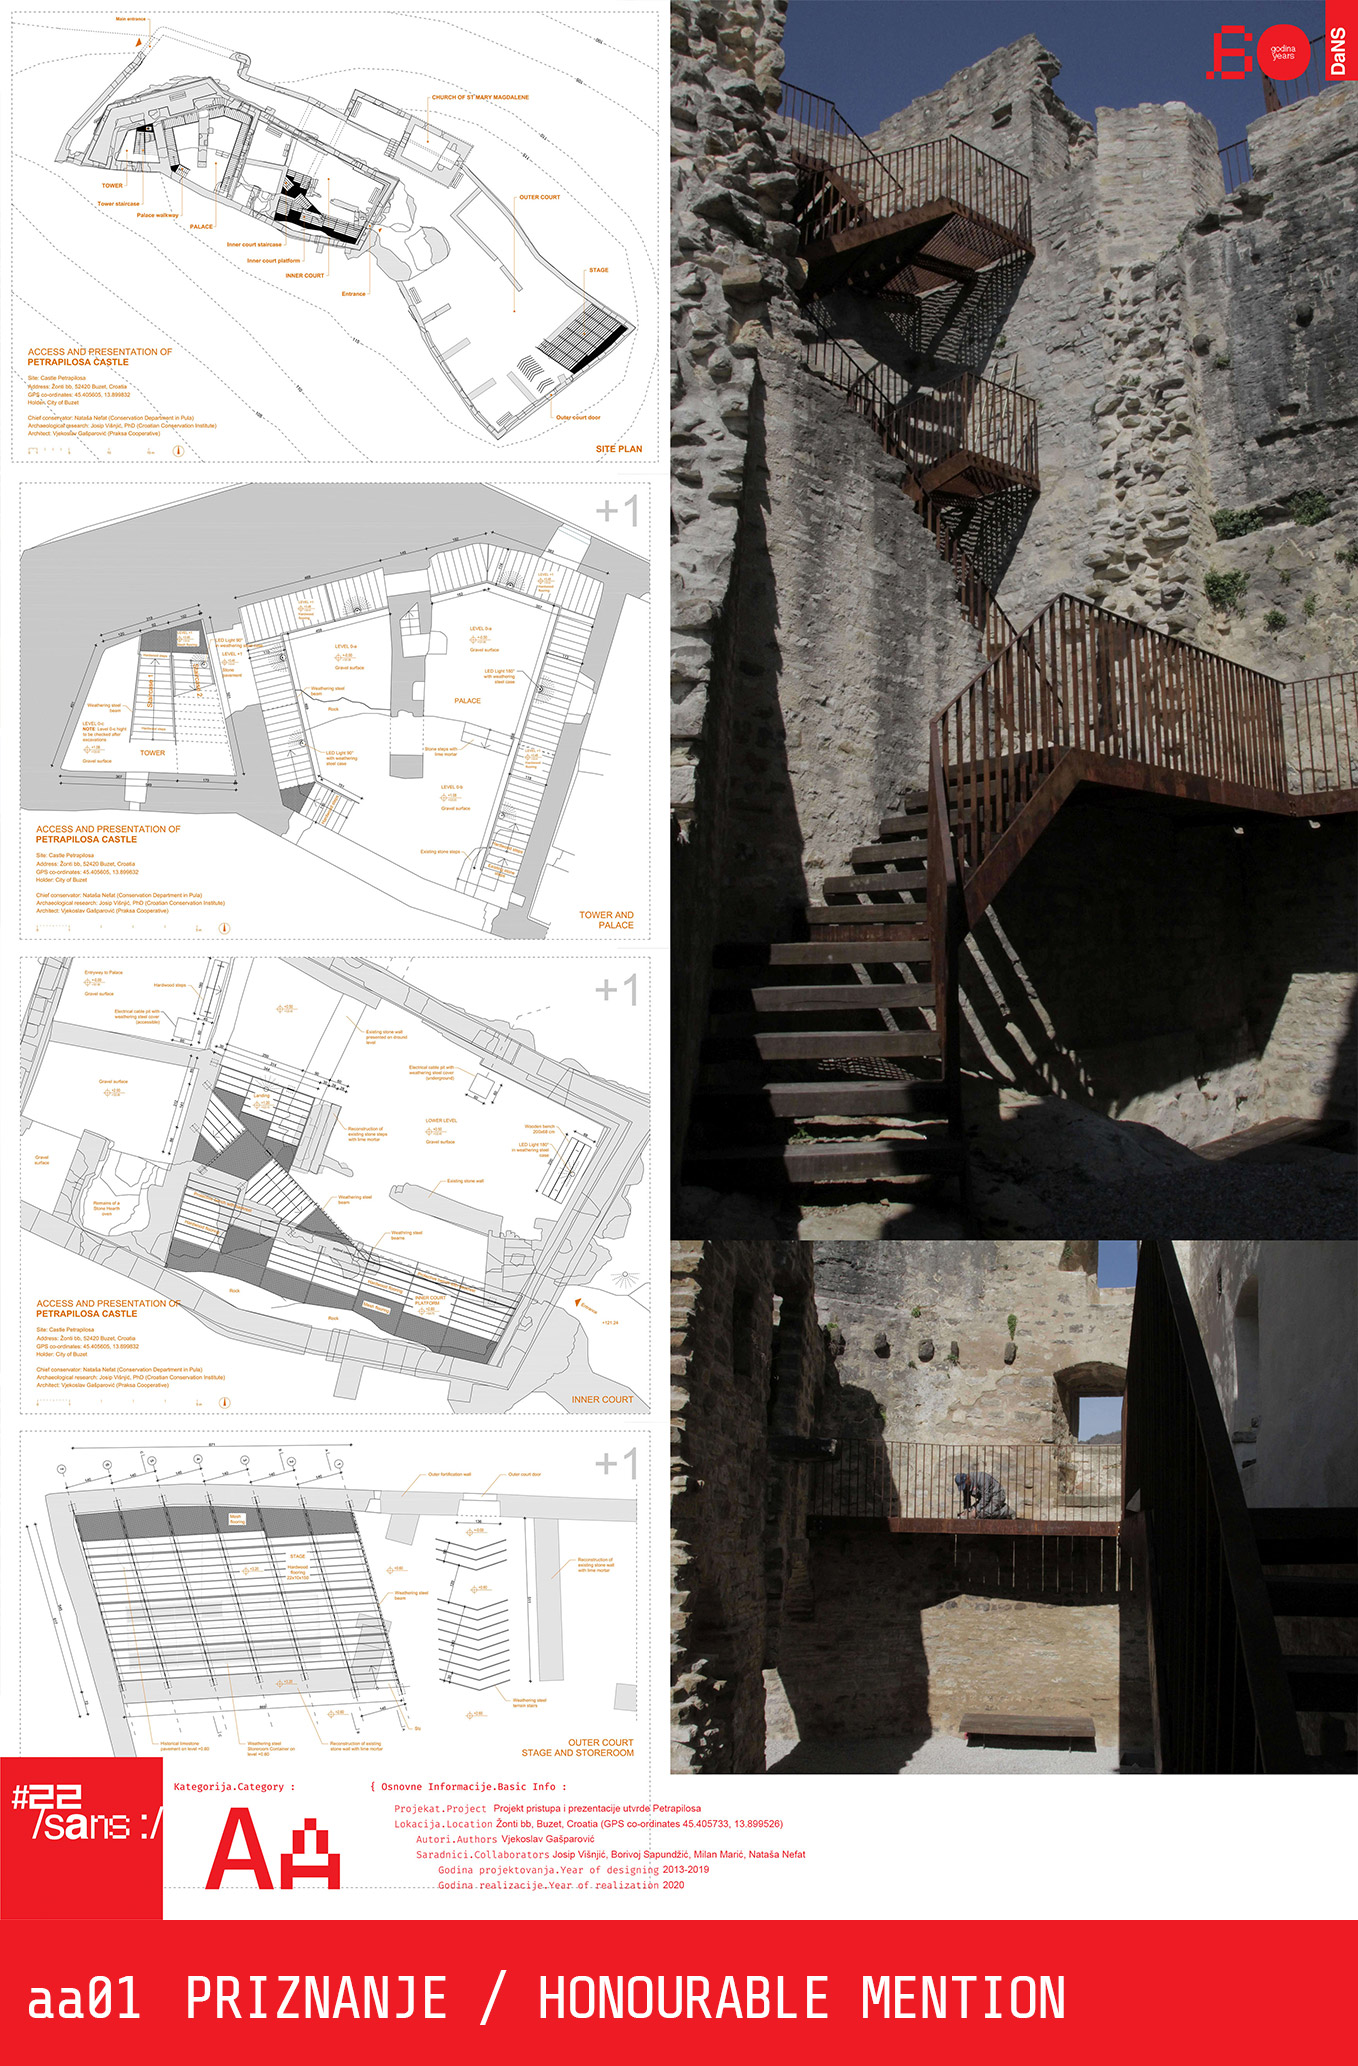 "<p class=""naslov-br"">aa01</p>Projekt pristupa i prezentacije utvrde Petrapilosa // Project of the approach and the presentation of the Petrapilos fortress"